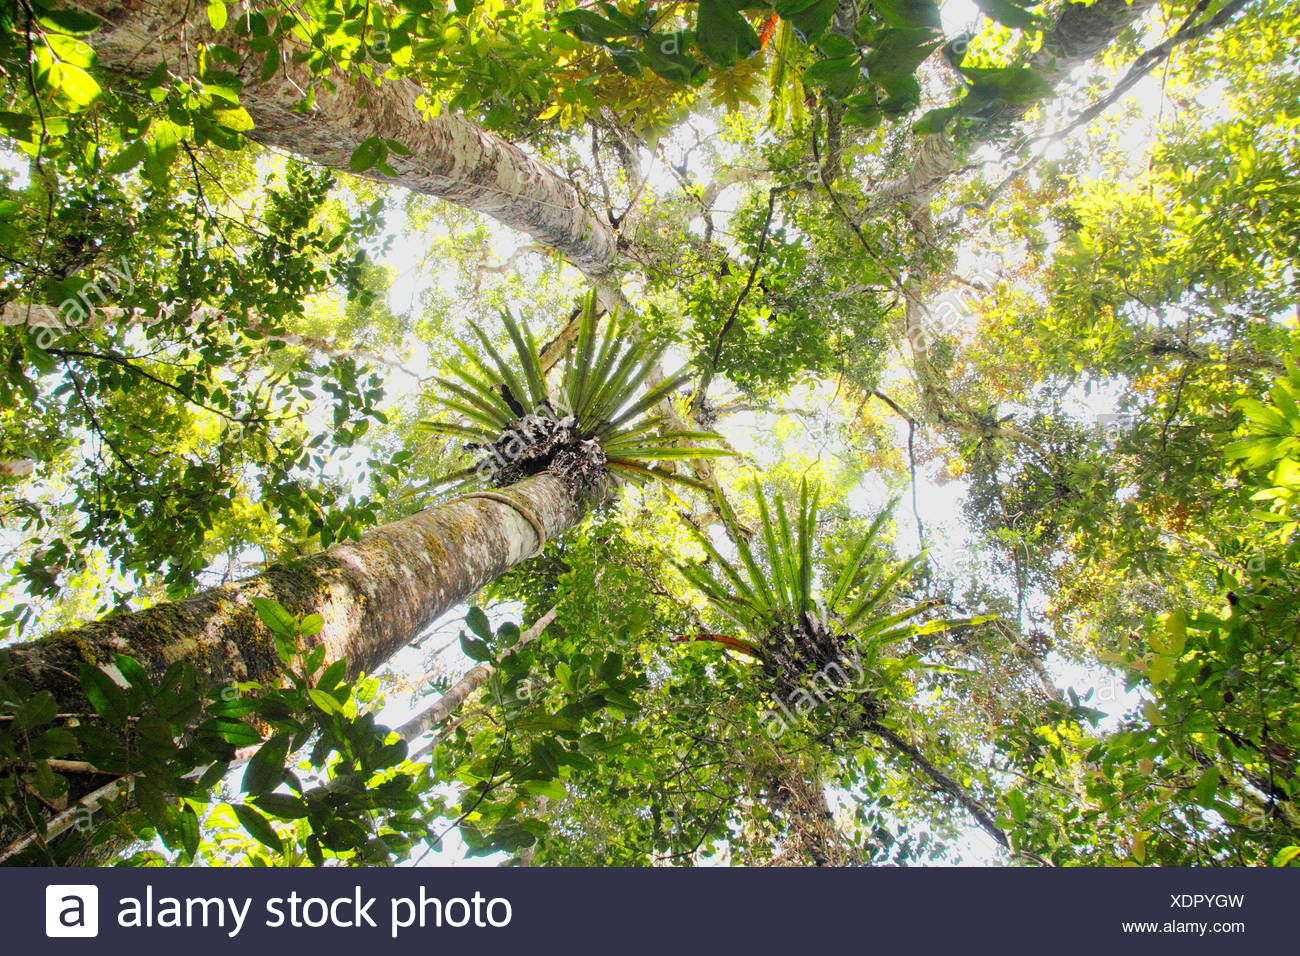 Blick in die Baumkronen die topische Regenwald, Madagaskar, Mantadia Andasibe Nationalpark Stockbild